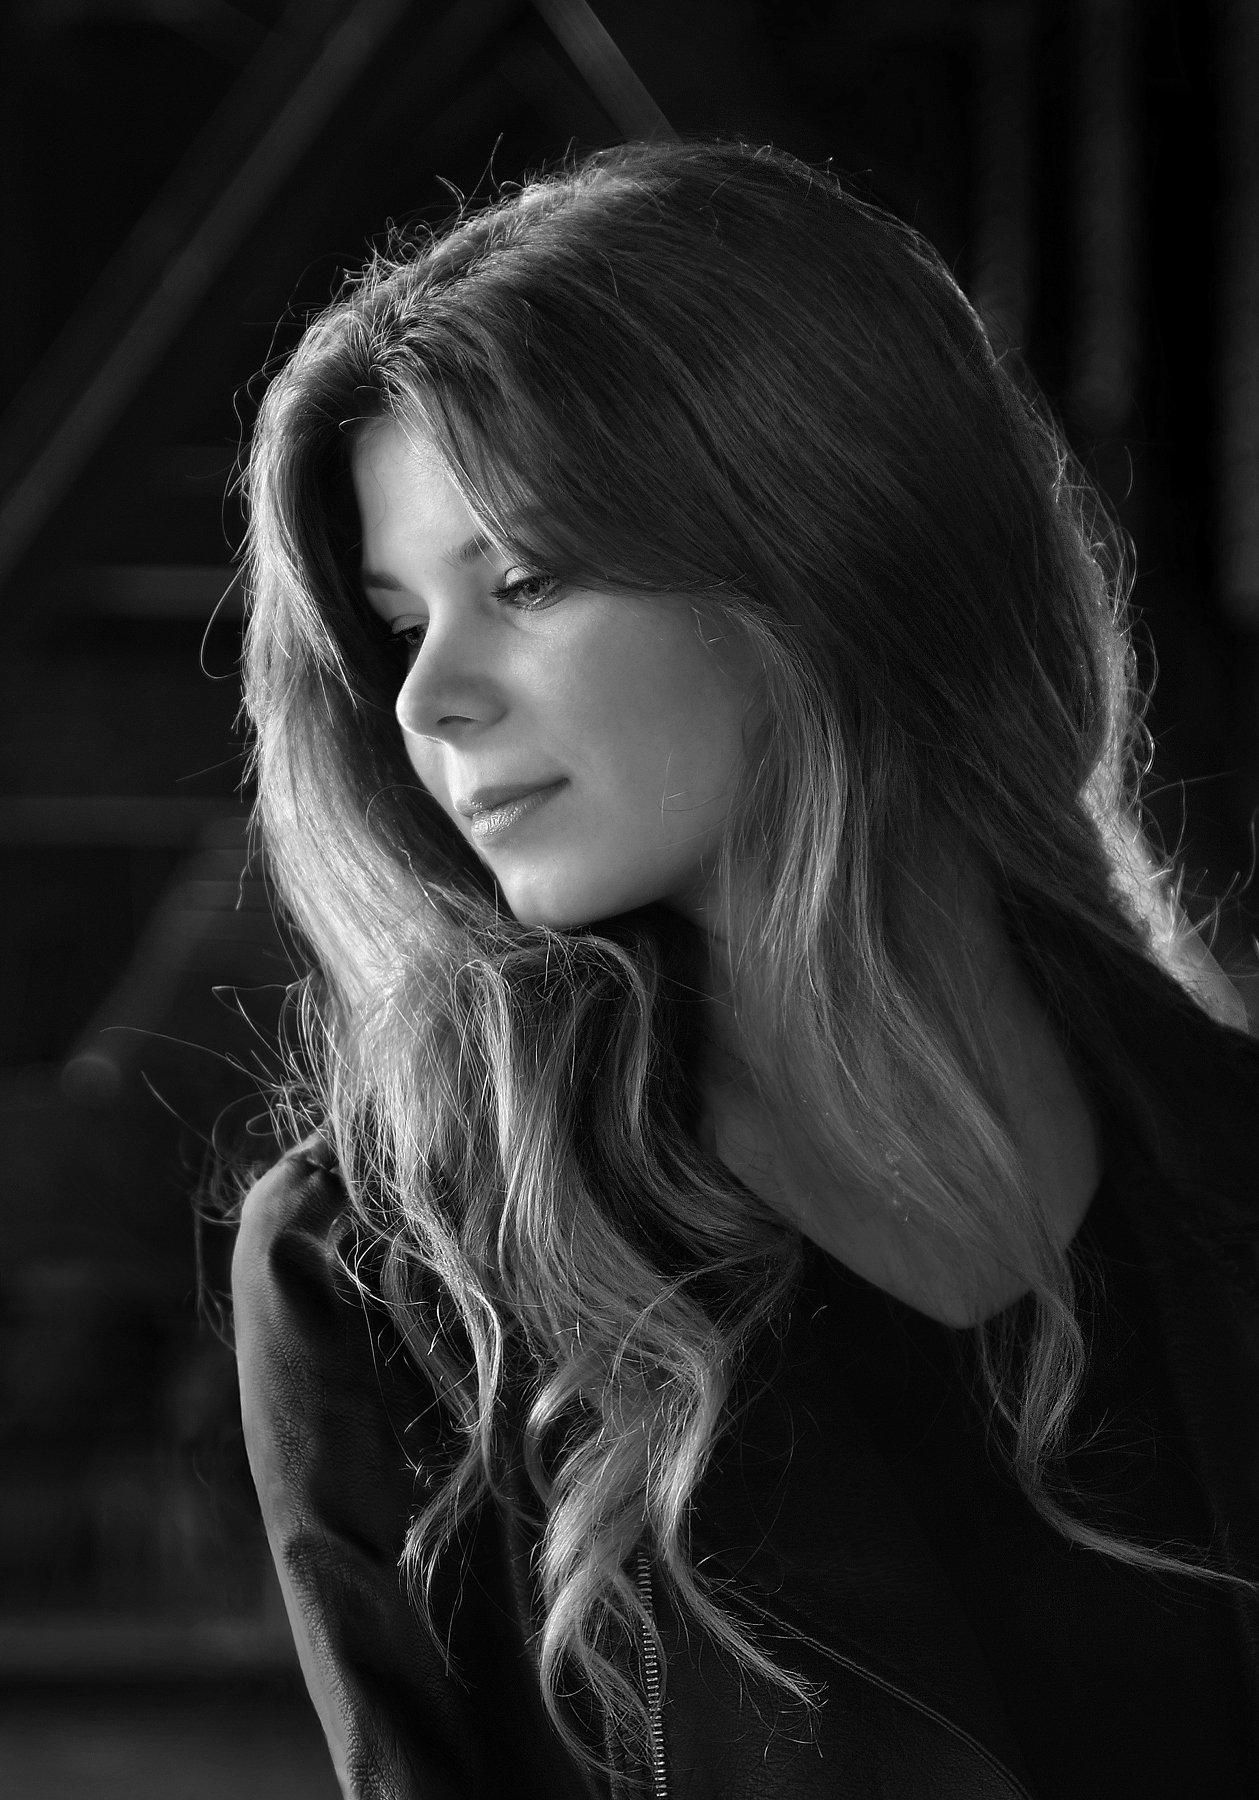 girl, portrait, face, eyes, hair, emotive, parisienne, monochrome, backlight, paris, dark, Endegor